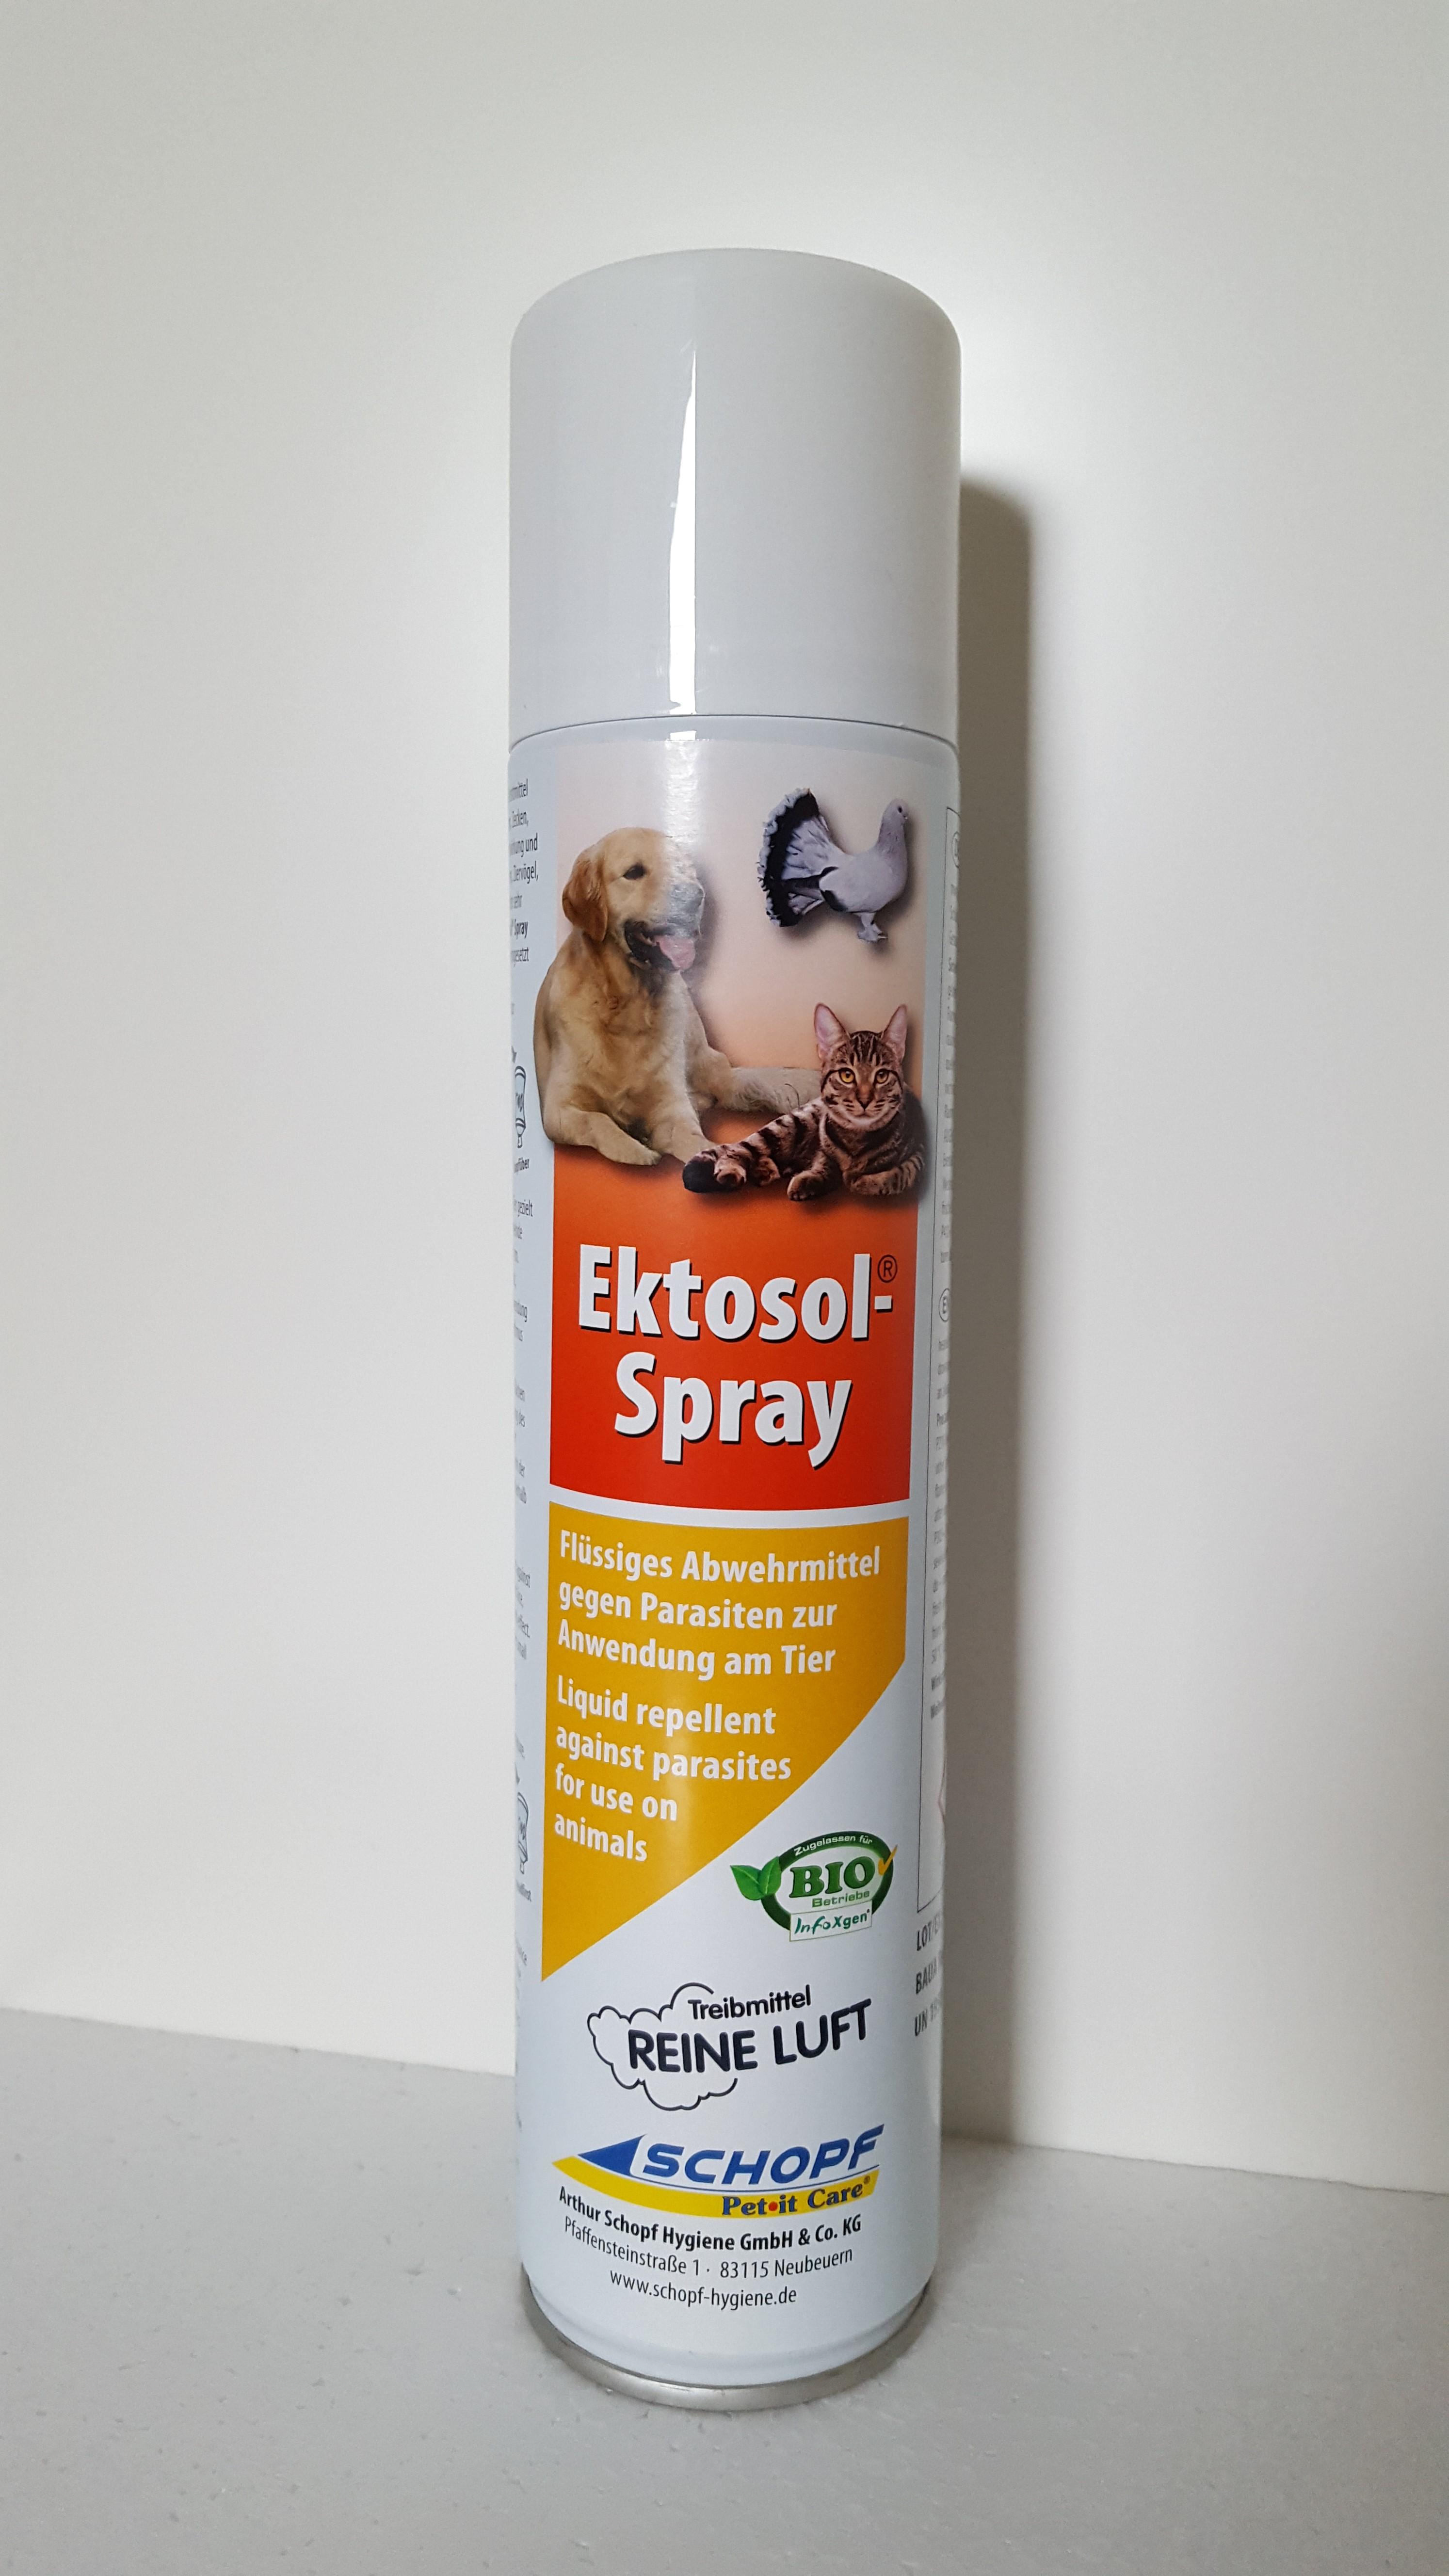 Ektosol Spray